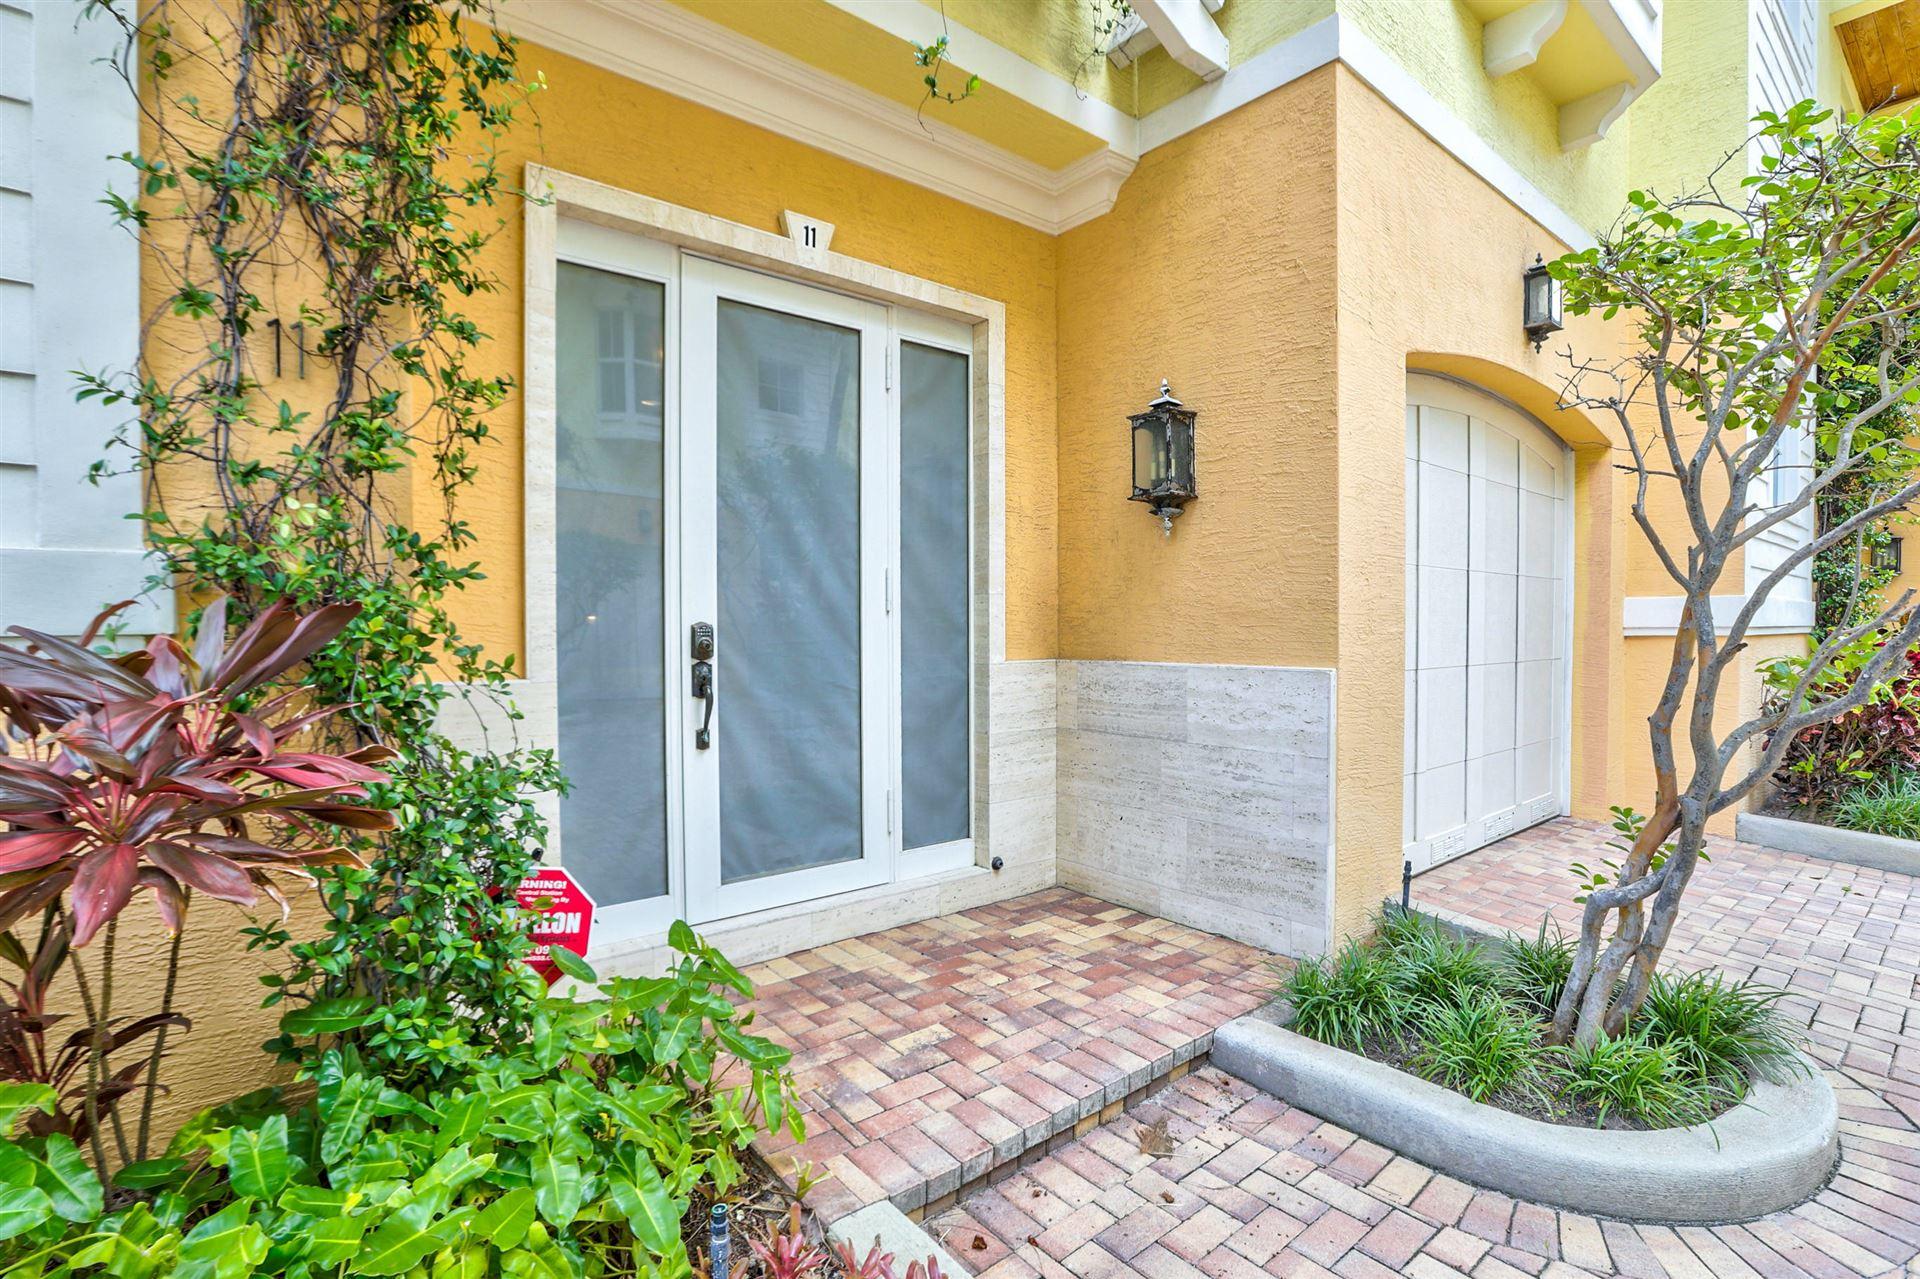 Photo of 4332 Sea Grape Drive #11, Lauderdale By The Sea, FL 33308 (MLS # RX-10645263)